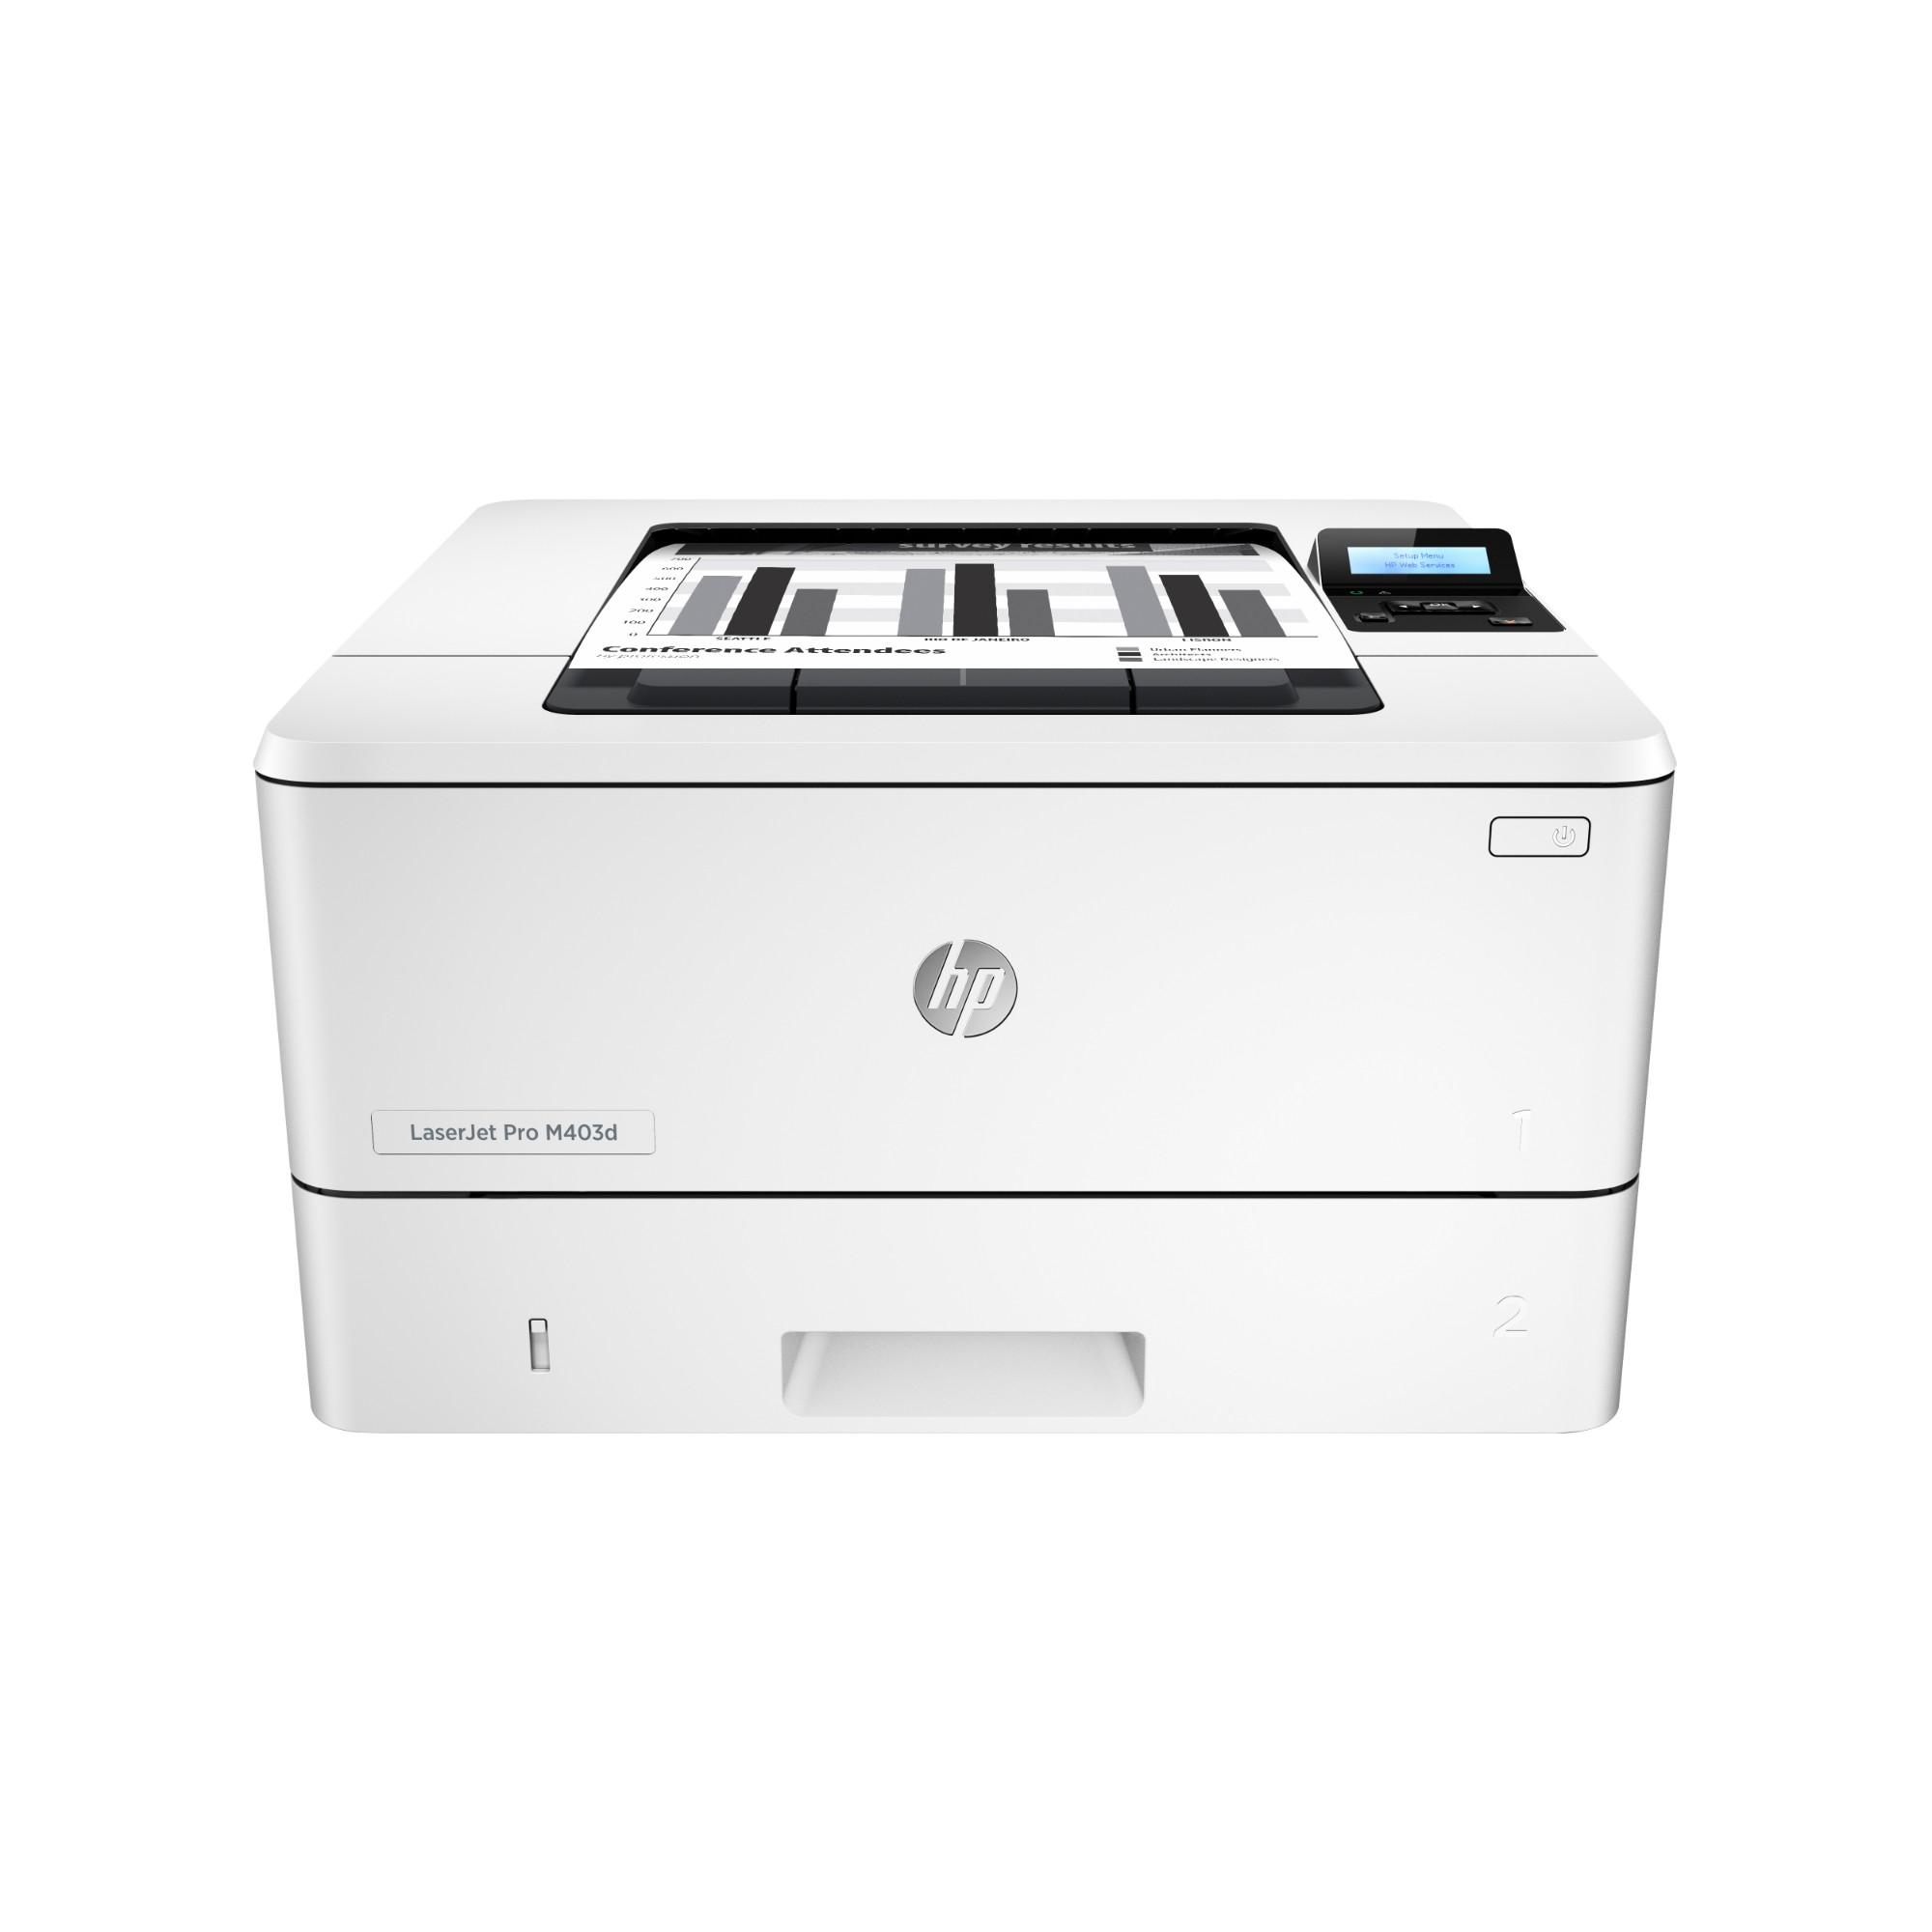 HP LaserJet Pro M402d 1200 x 1200 DPI A4